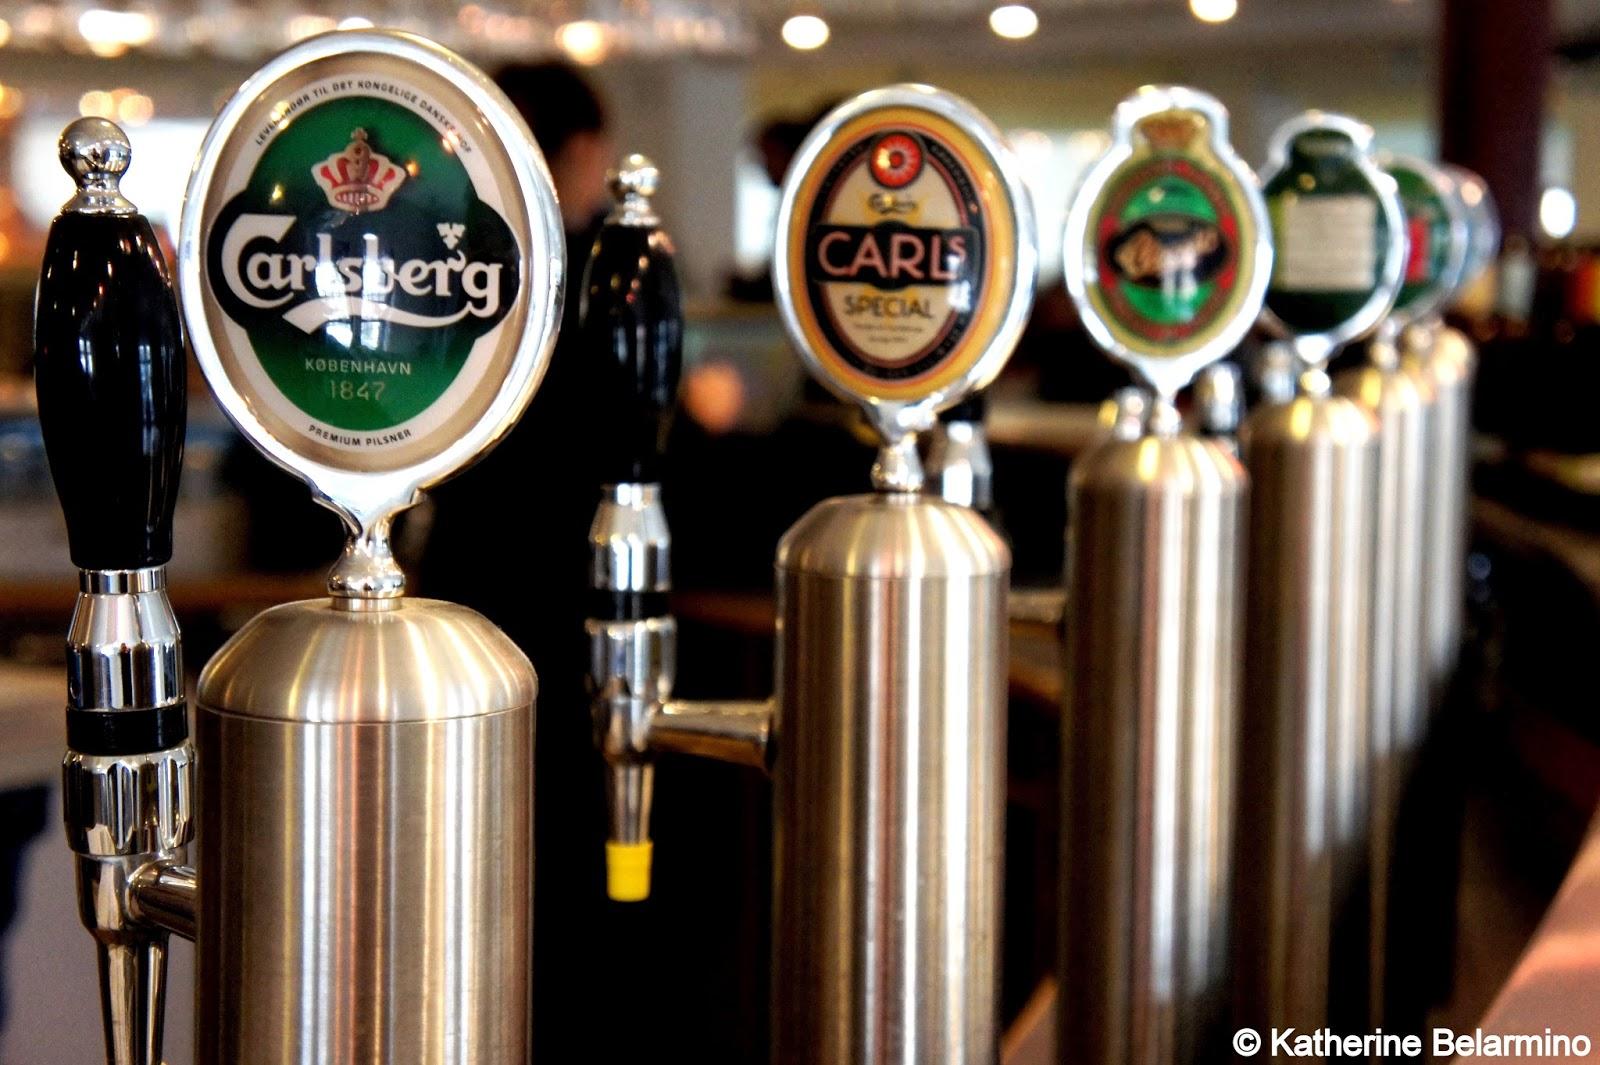 Carslberg Taps Carlsberg Brewery Copenhagen Denmark